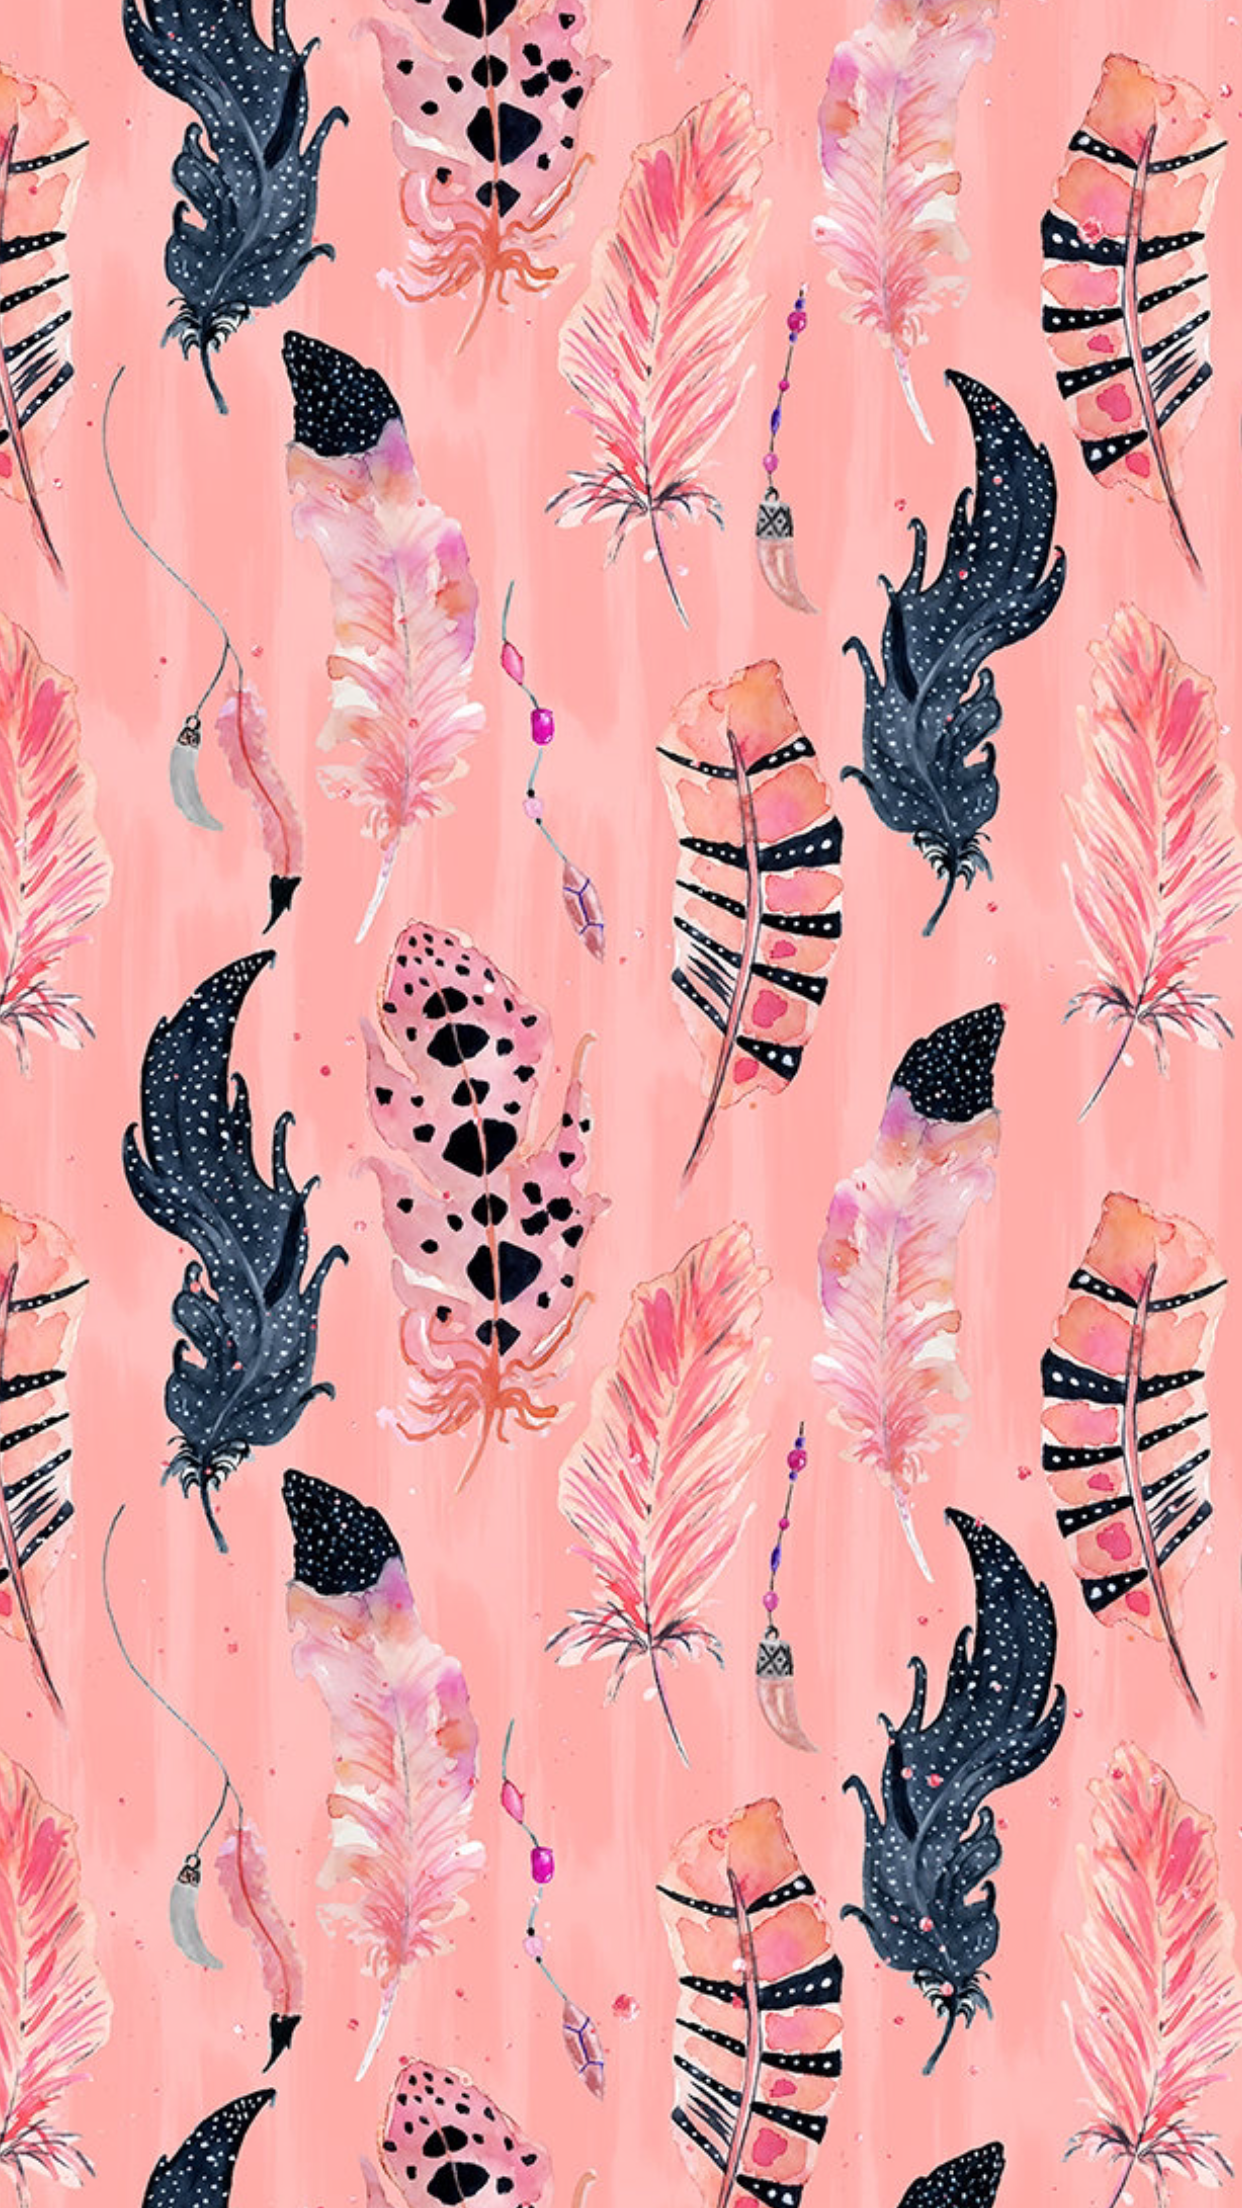 Wallpaper iPhone Pink wallpaper iphone